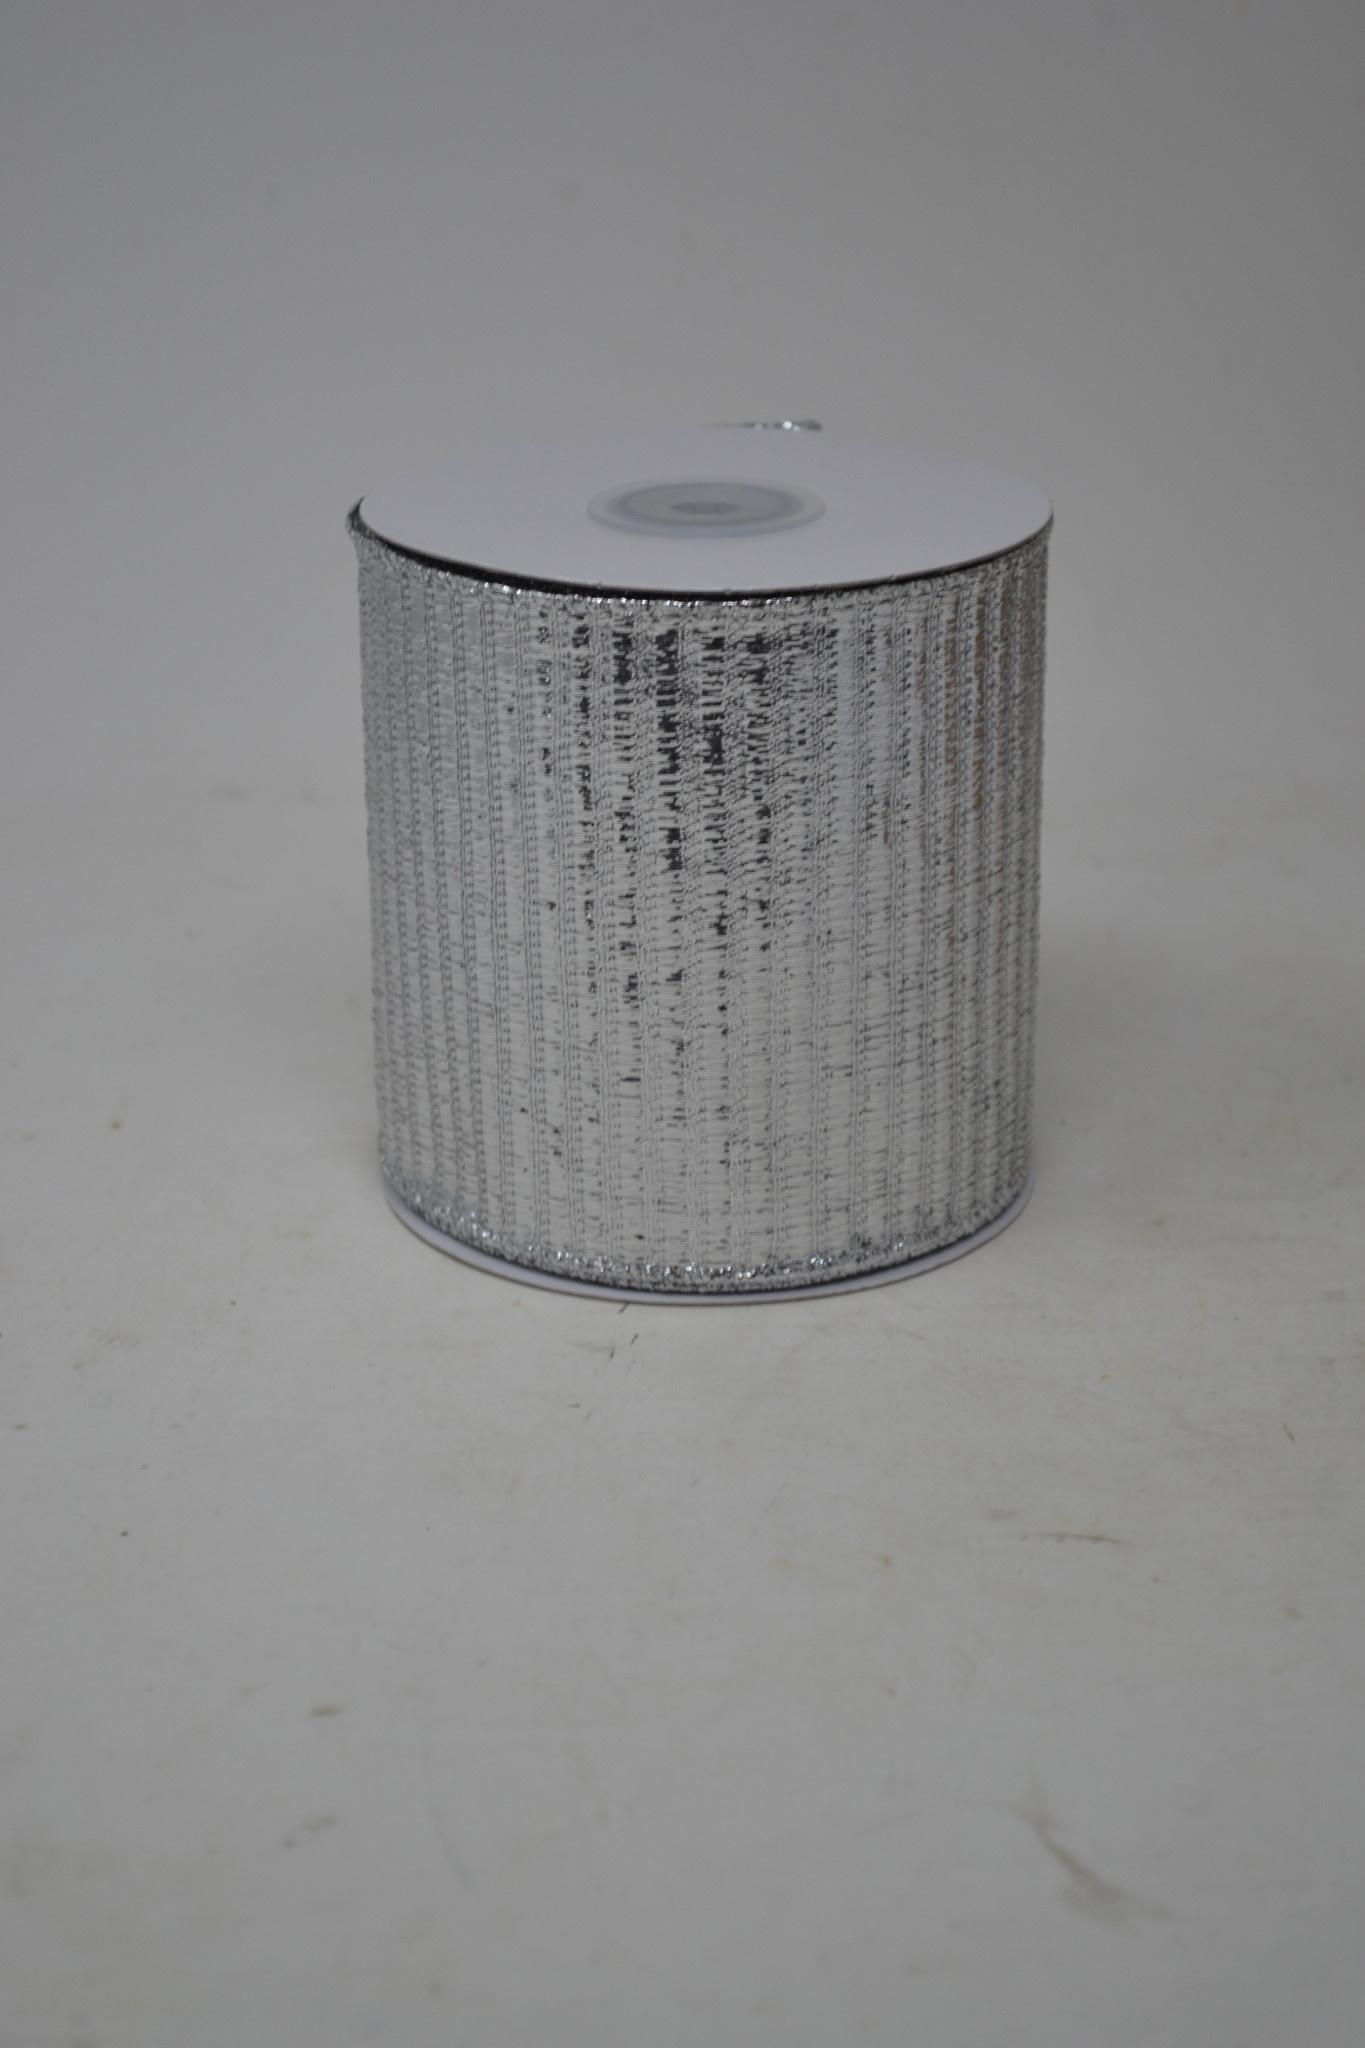 Lame Striped Metallic Wired Edged Ribbon